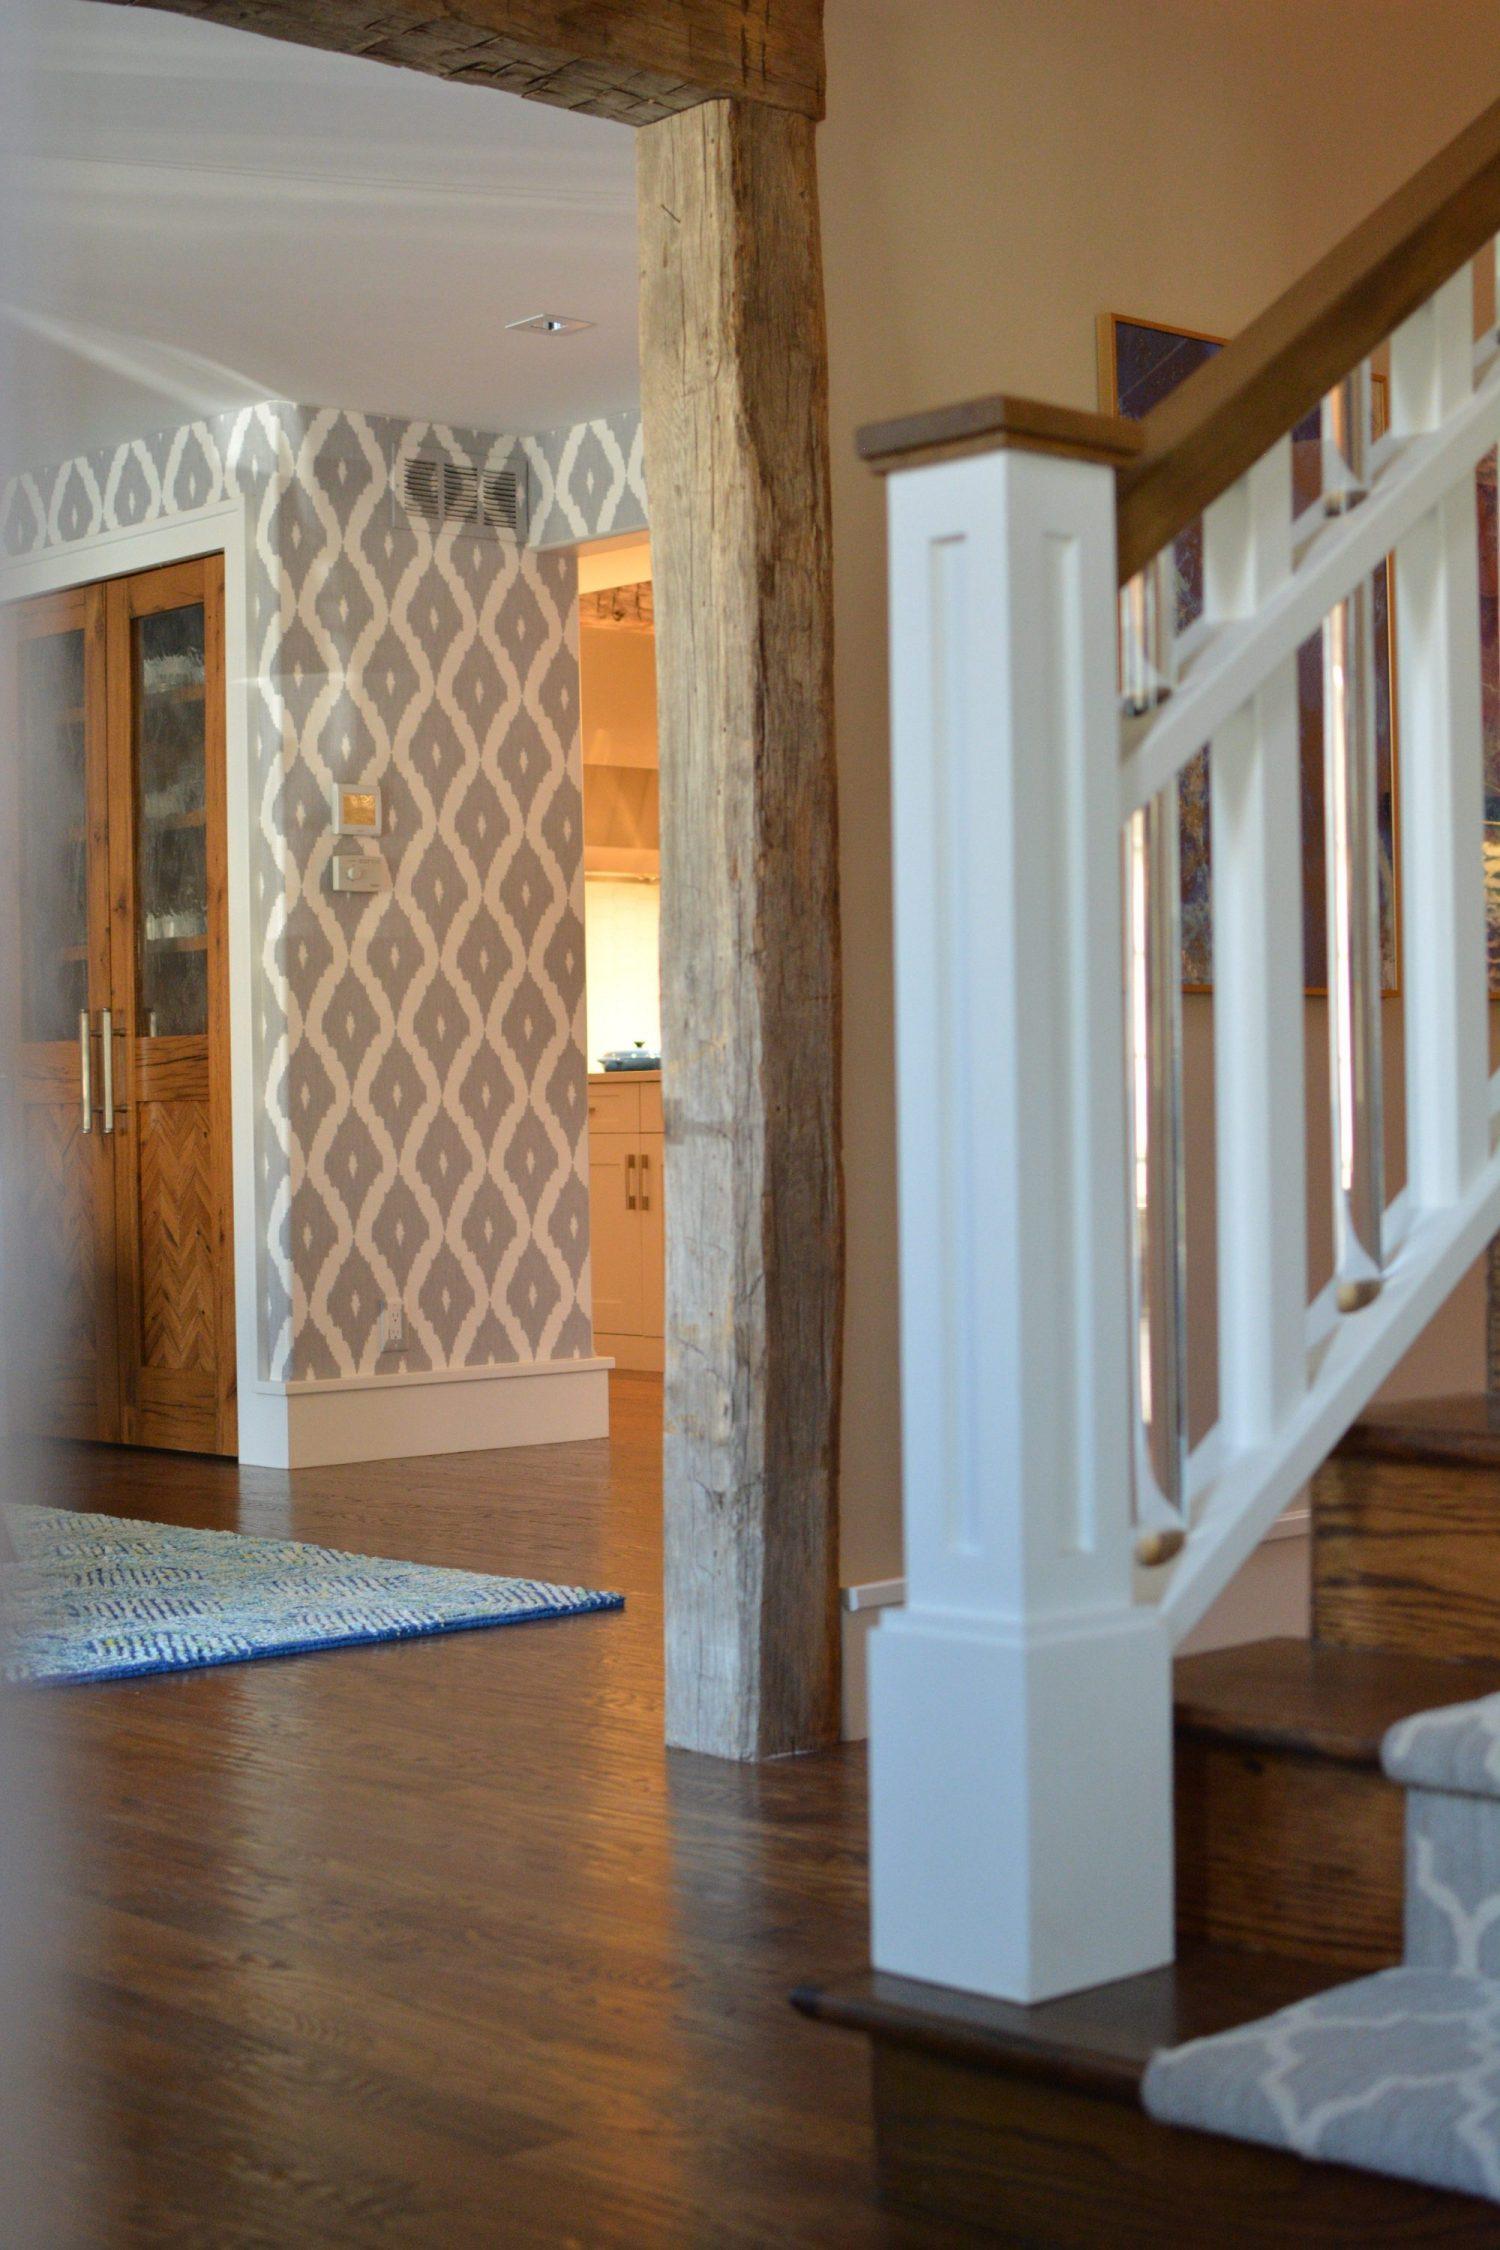 Custom Wood Molding and Floors